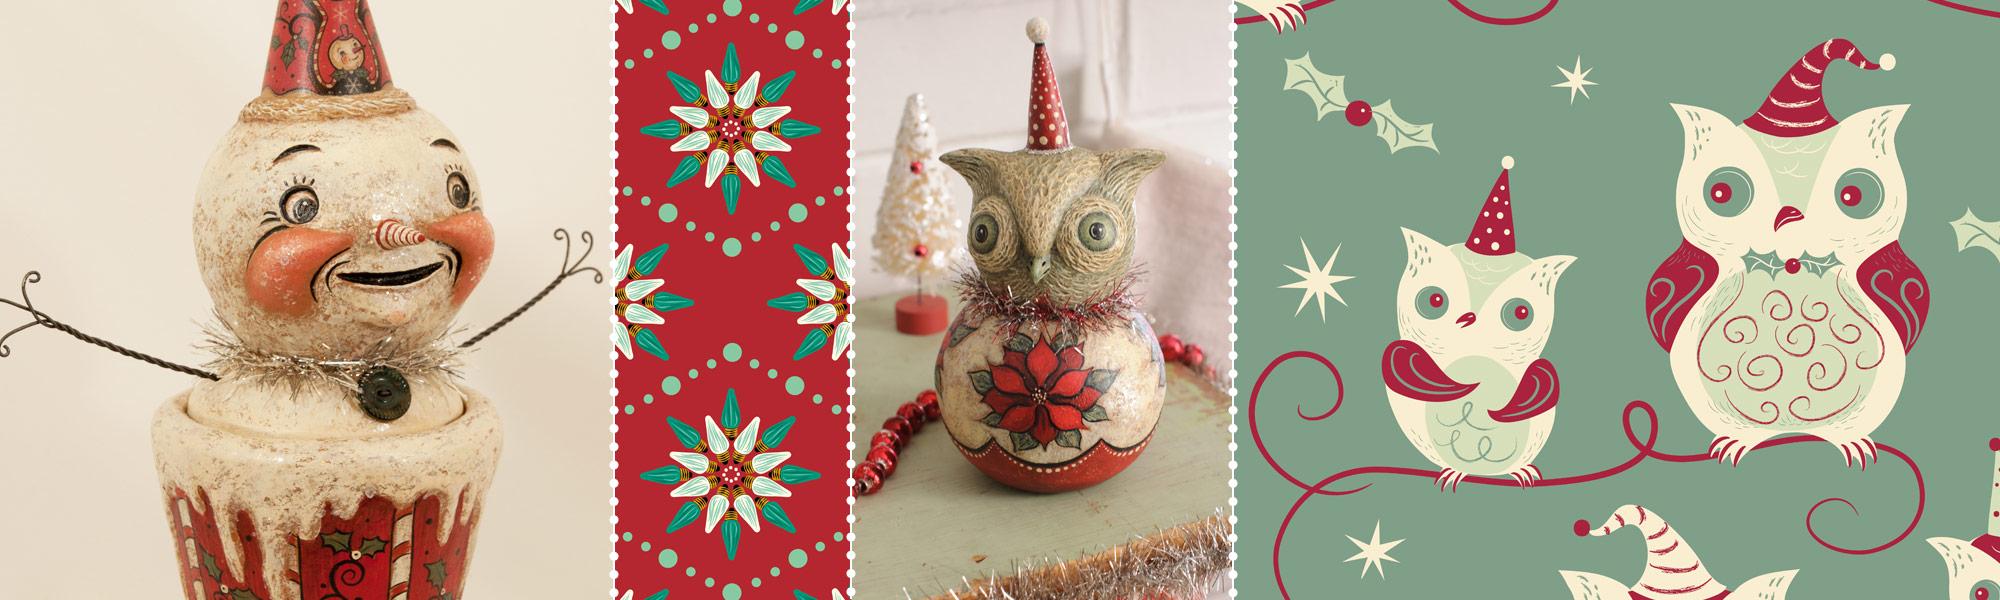 Johanna-Parker-Christmas-Owl-Banner.jpg